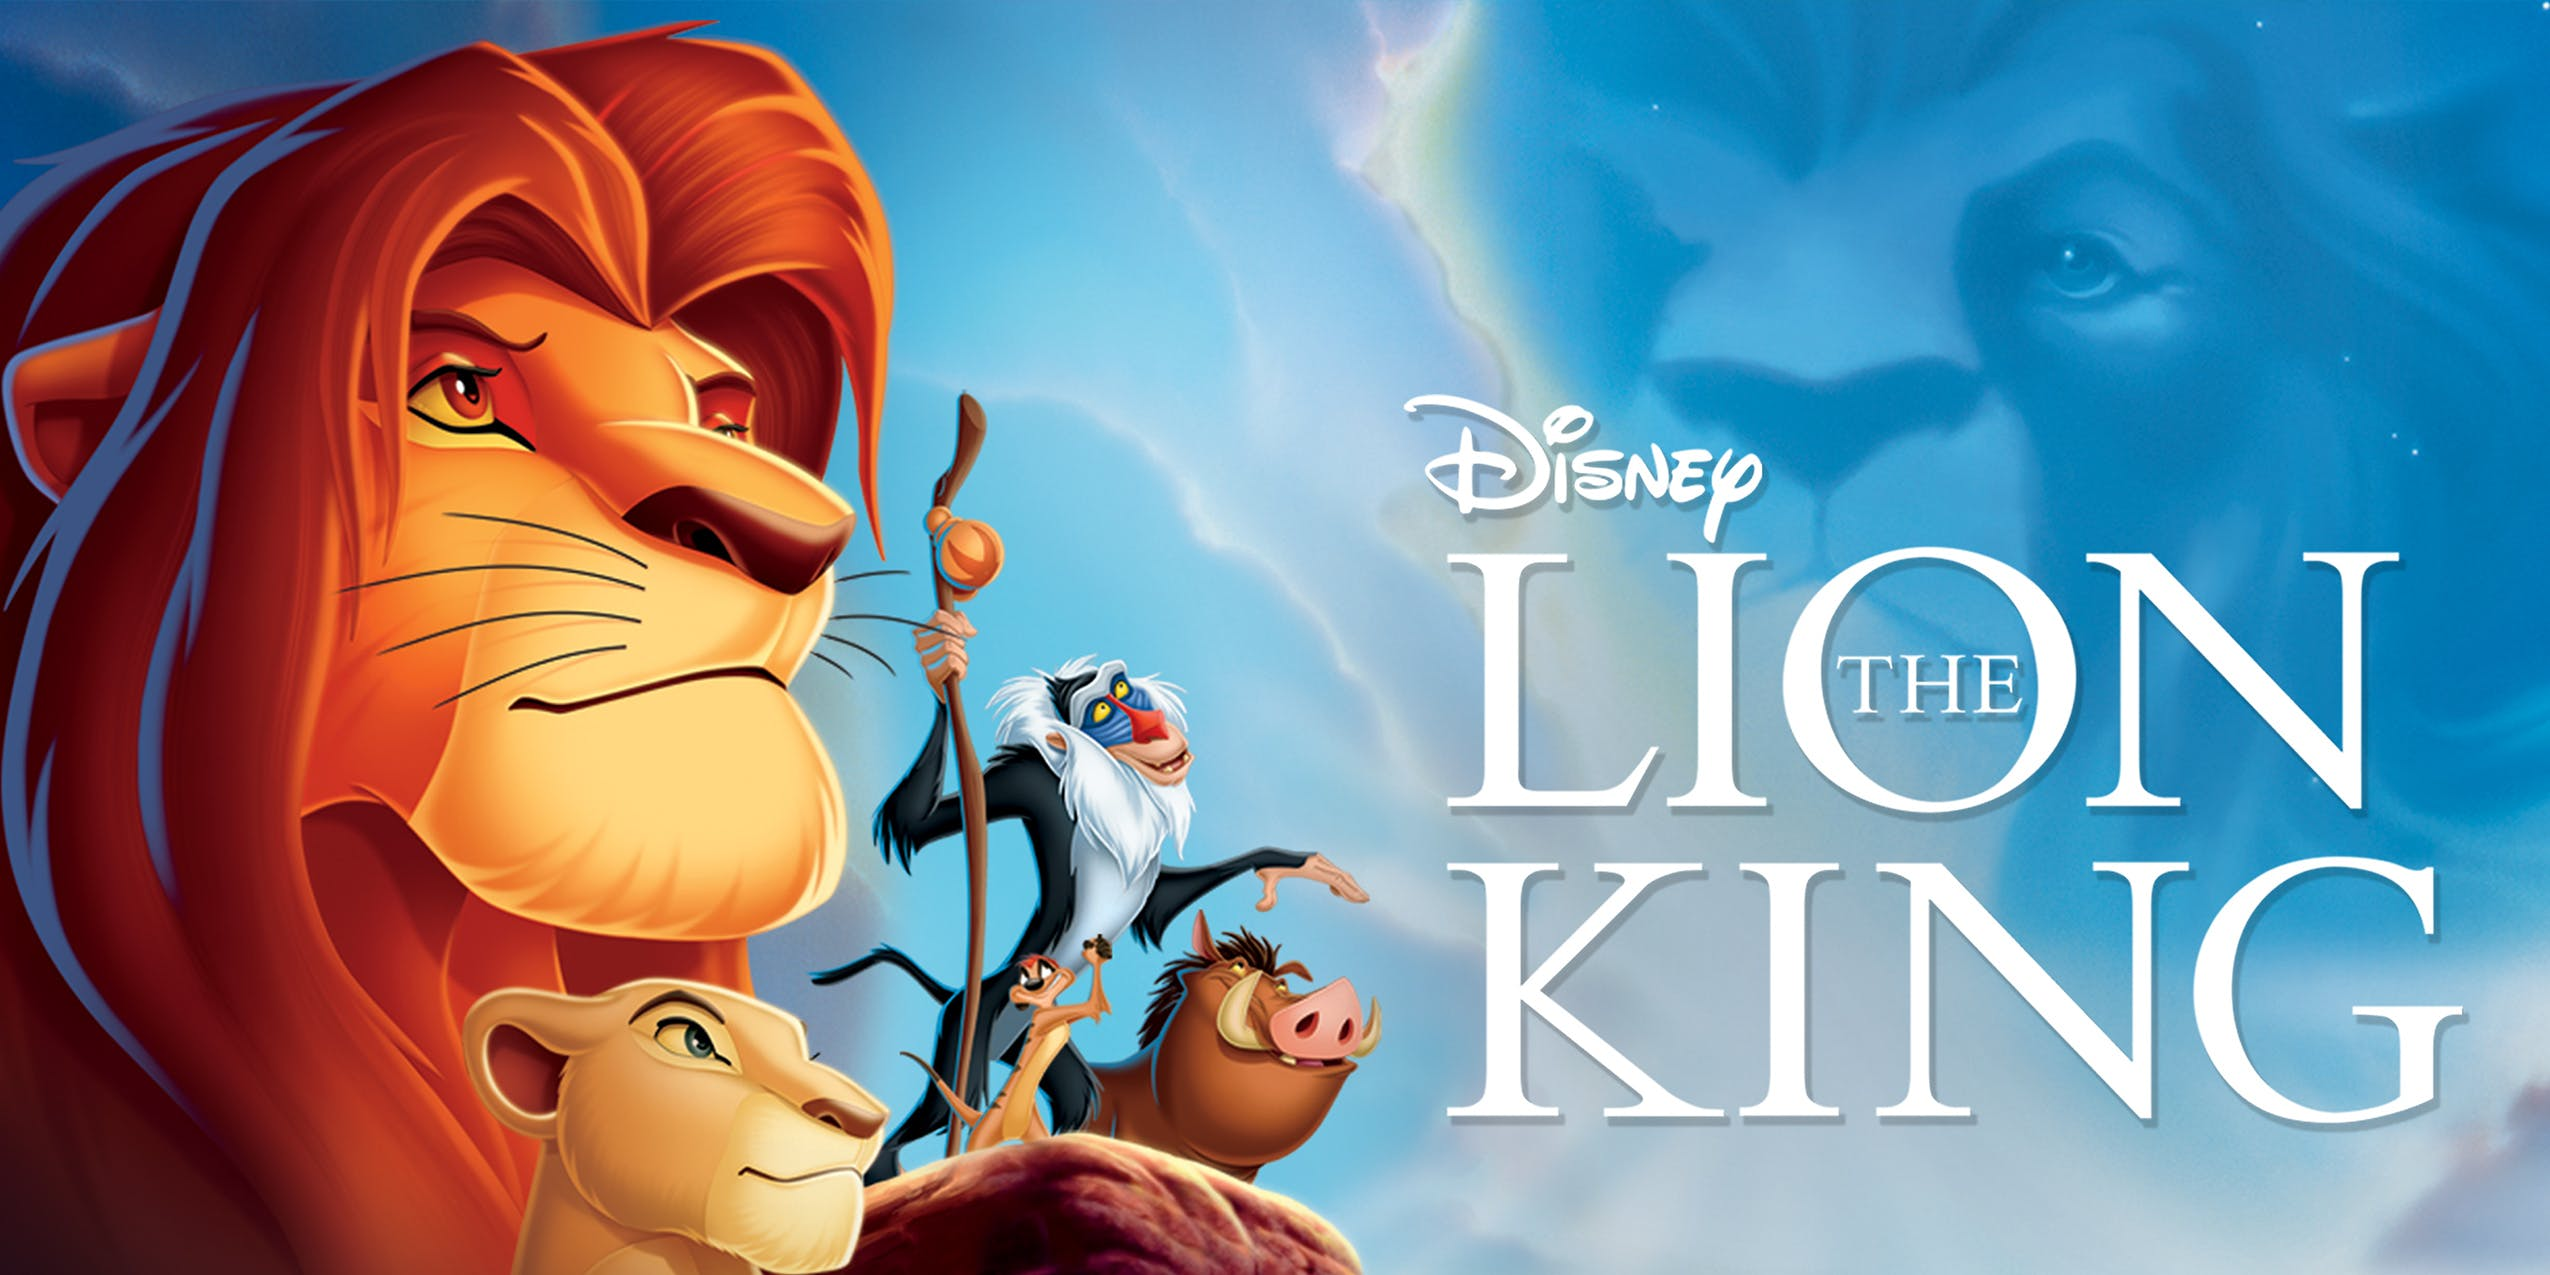 best movies Disney Plus lion king